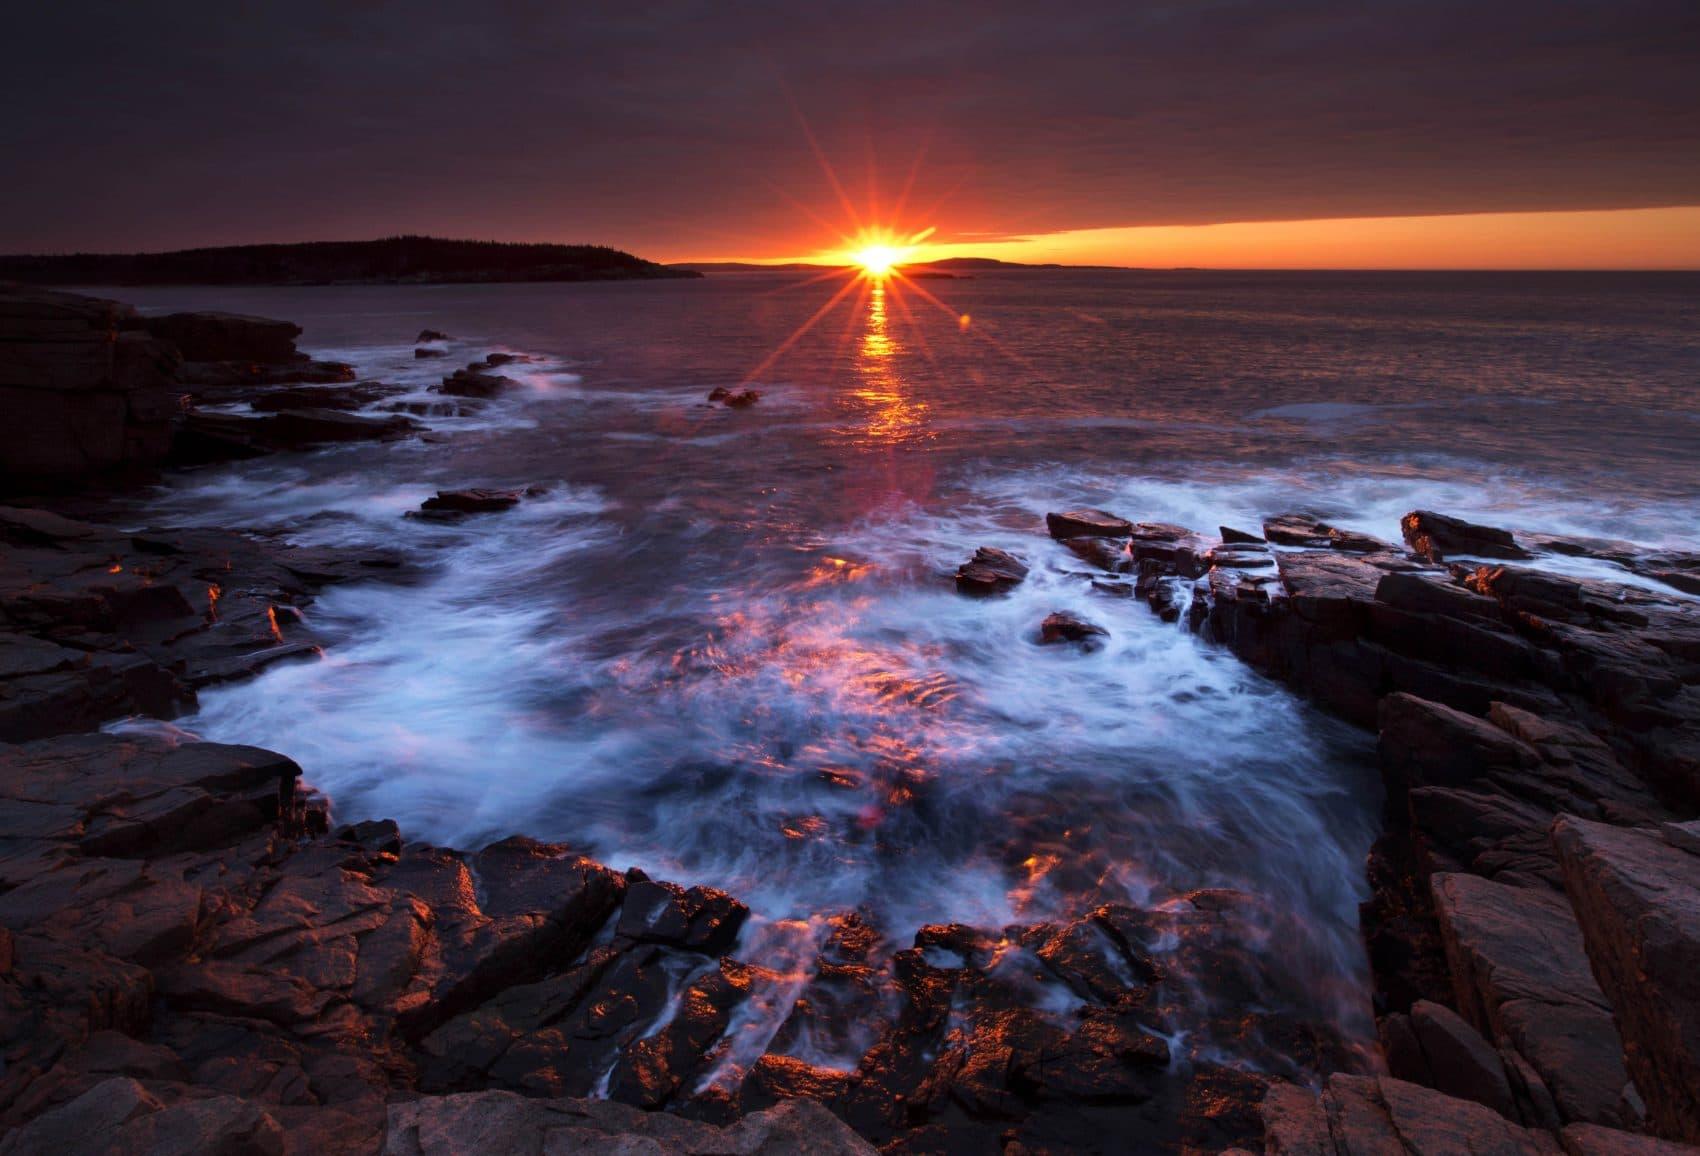 The sun's rays strike the rocky coast of Acadia National Park, in Maine, Thursday, May 2, 2013. (Robert F. Bukaty/AP)